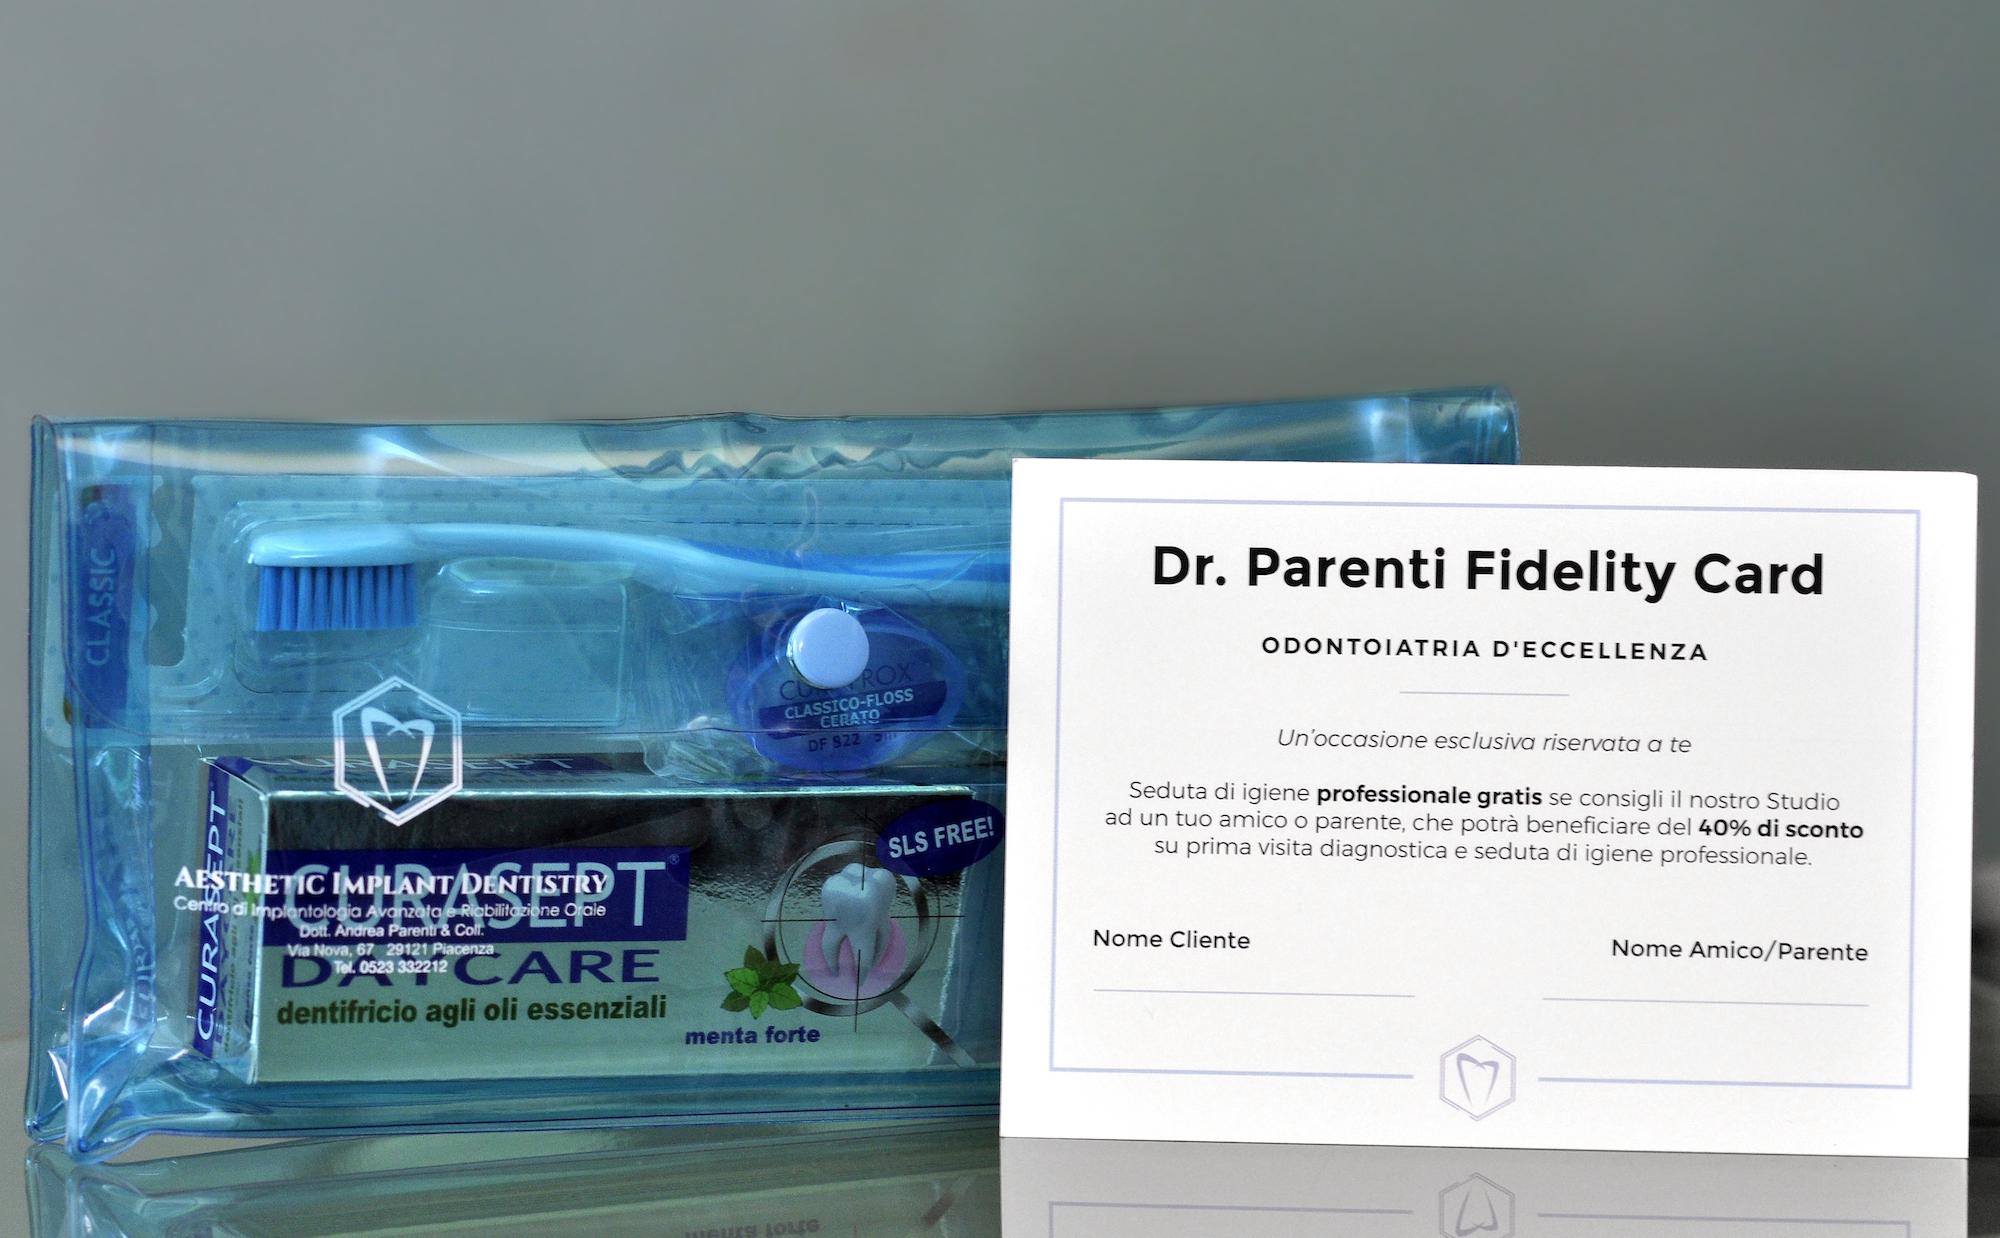 Dr. Parenti Fidelity Card